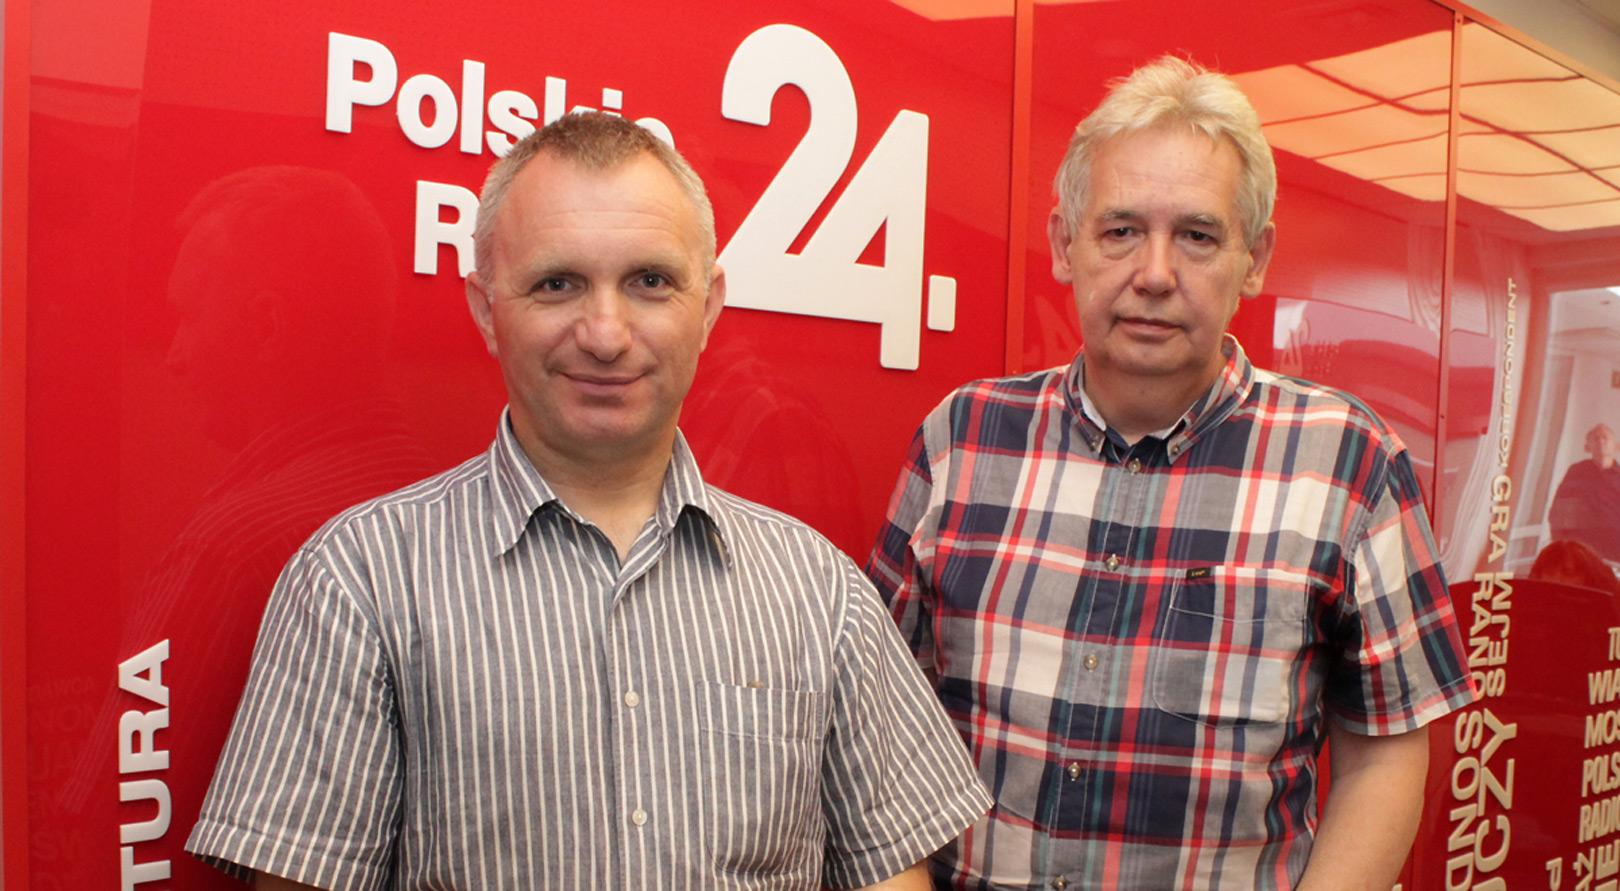 Фото: polskieradio